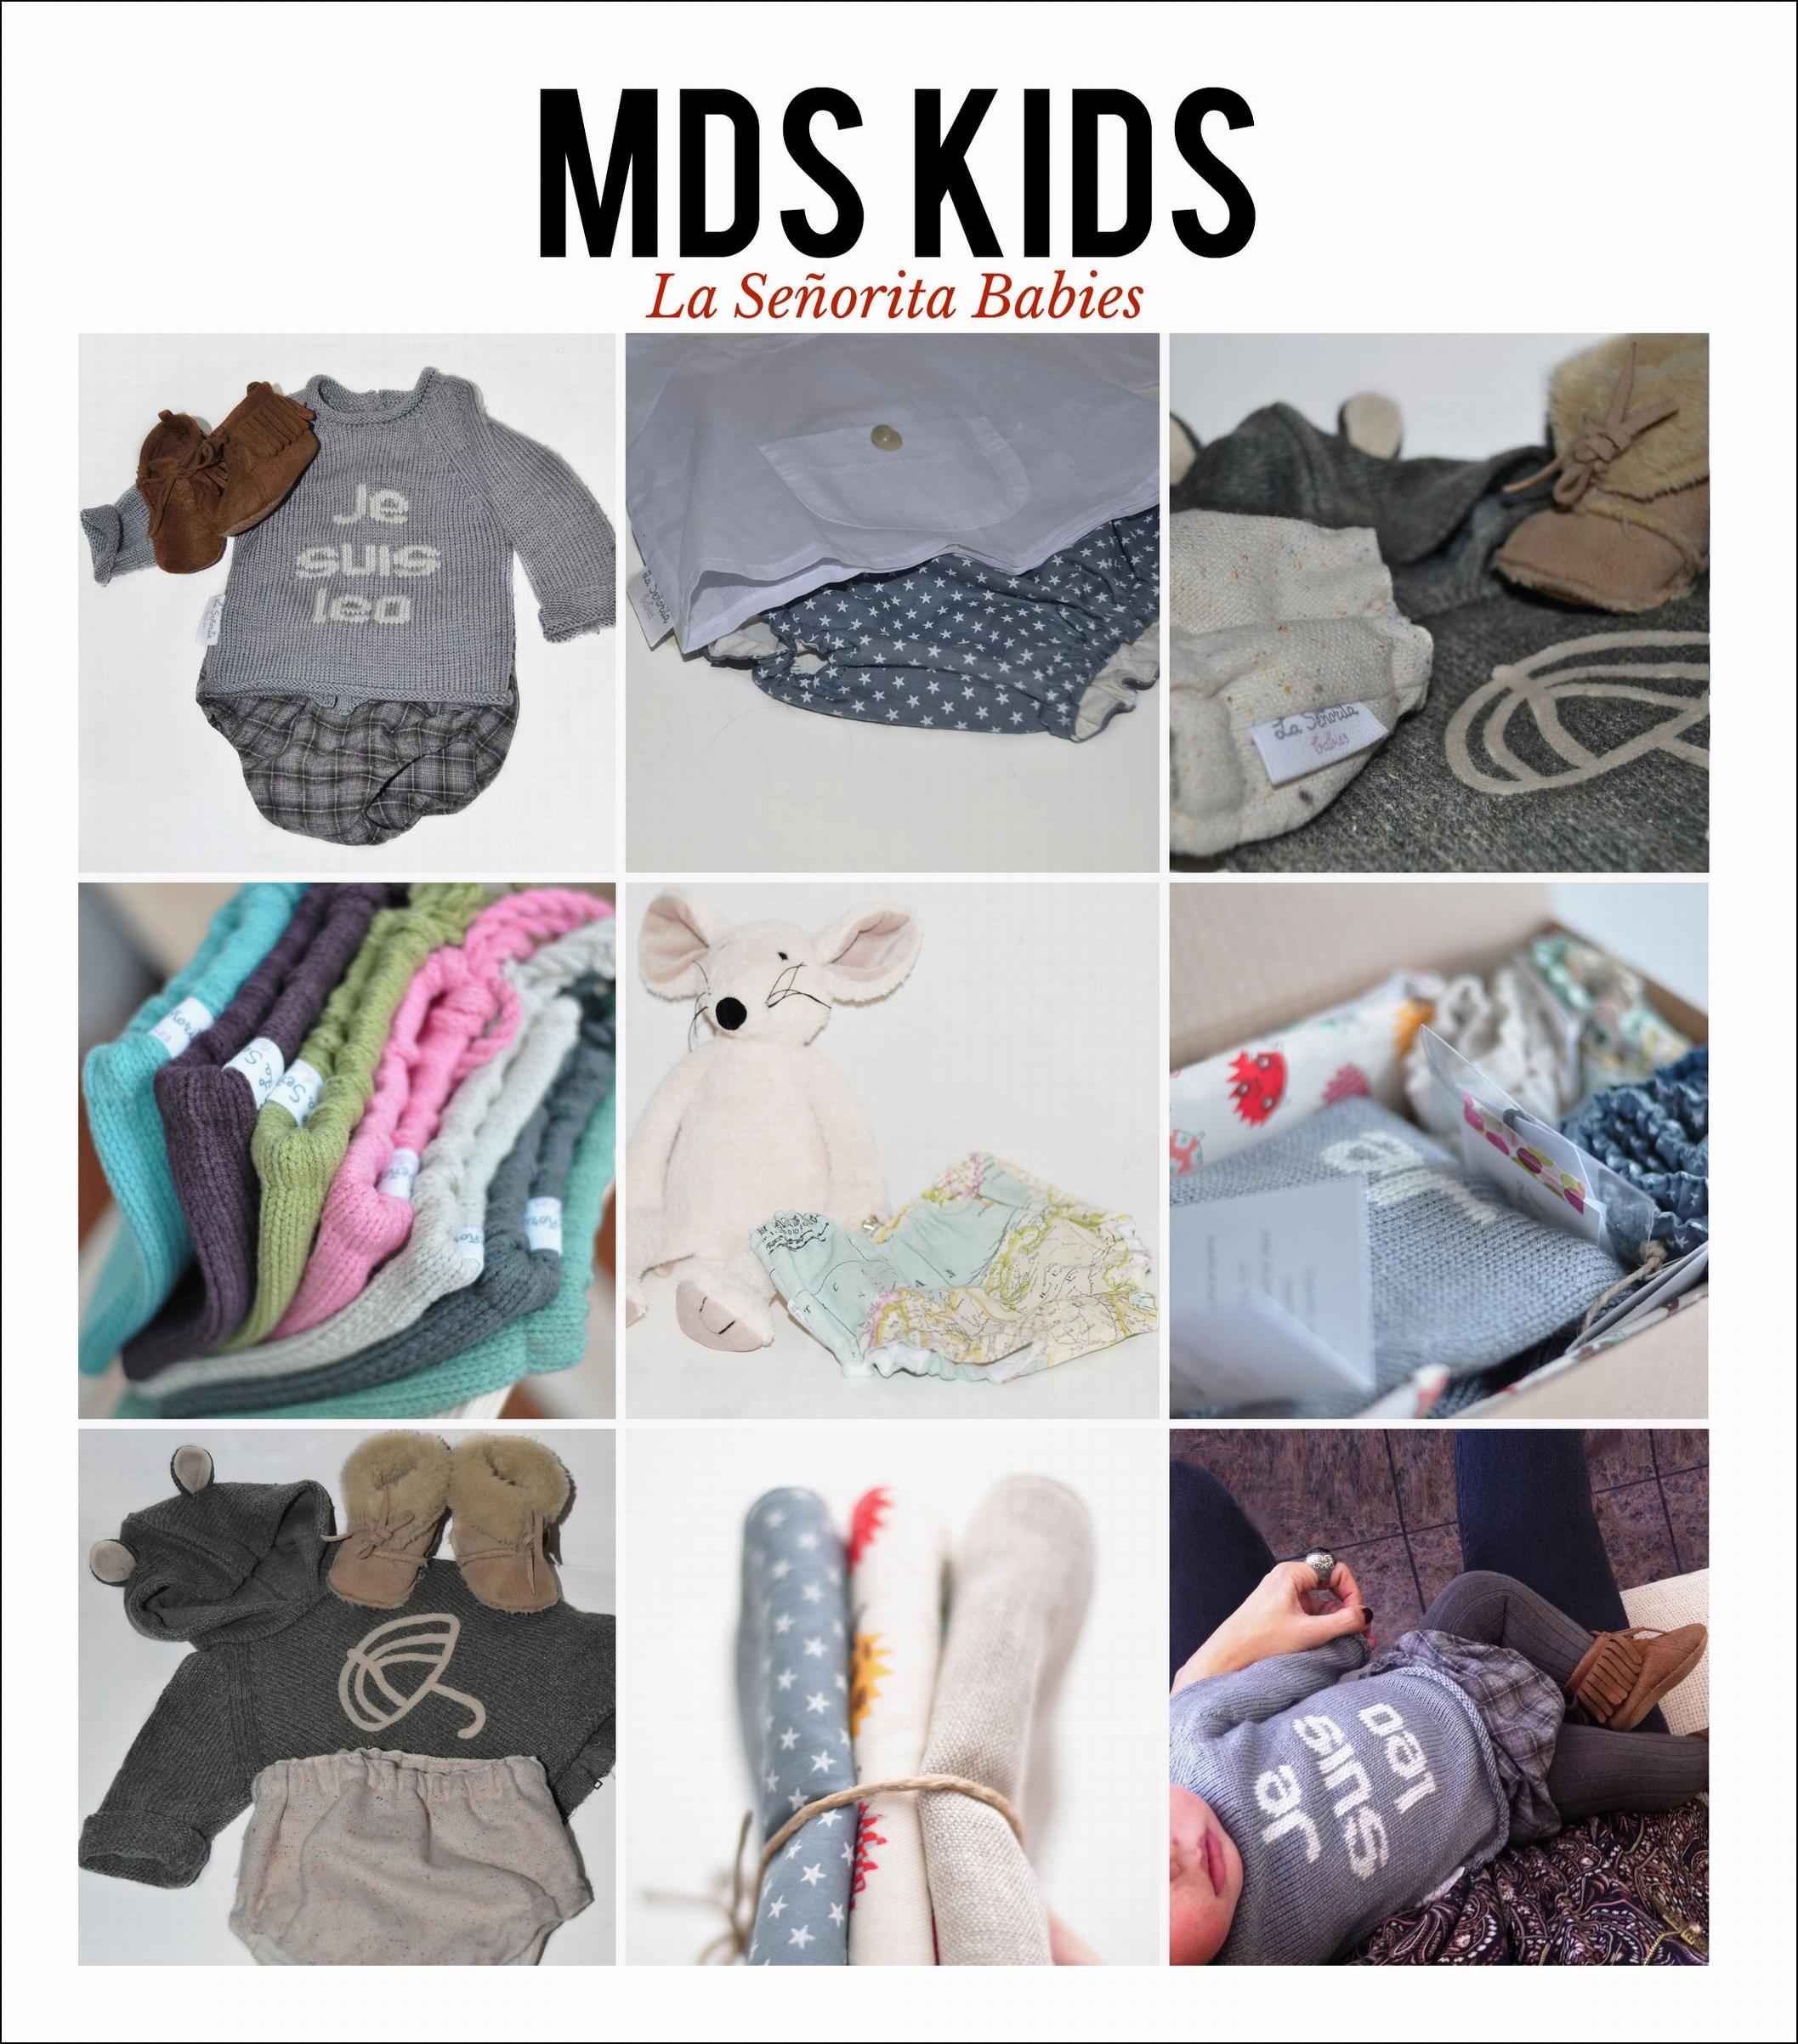 MDS KIDS: LA SEÑORITA BABIES-60148-mydailystyle